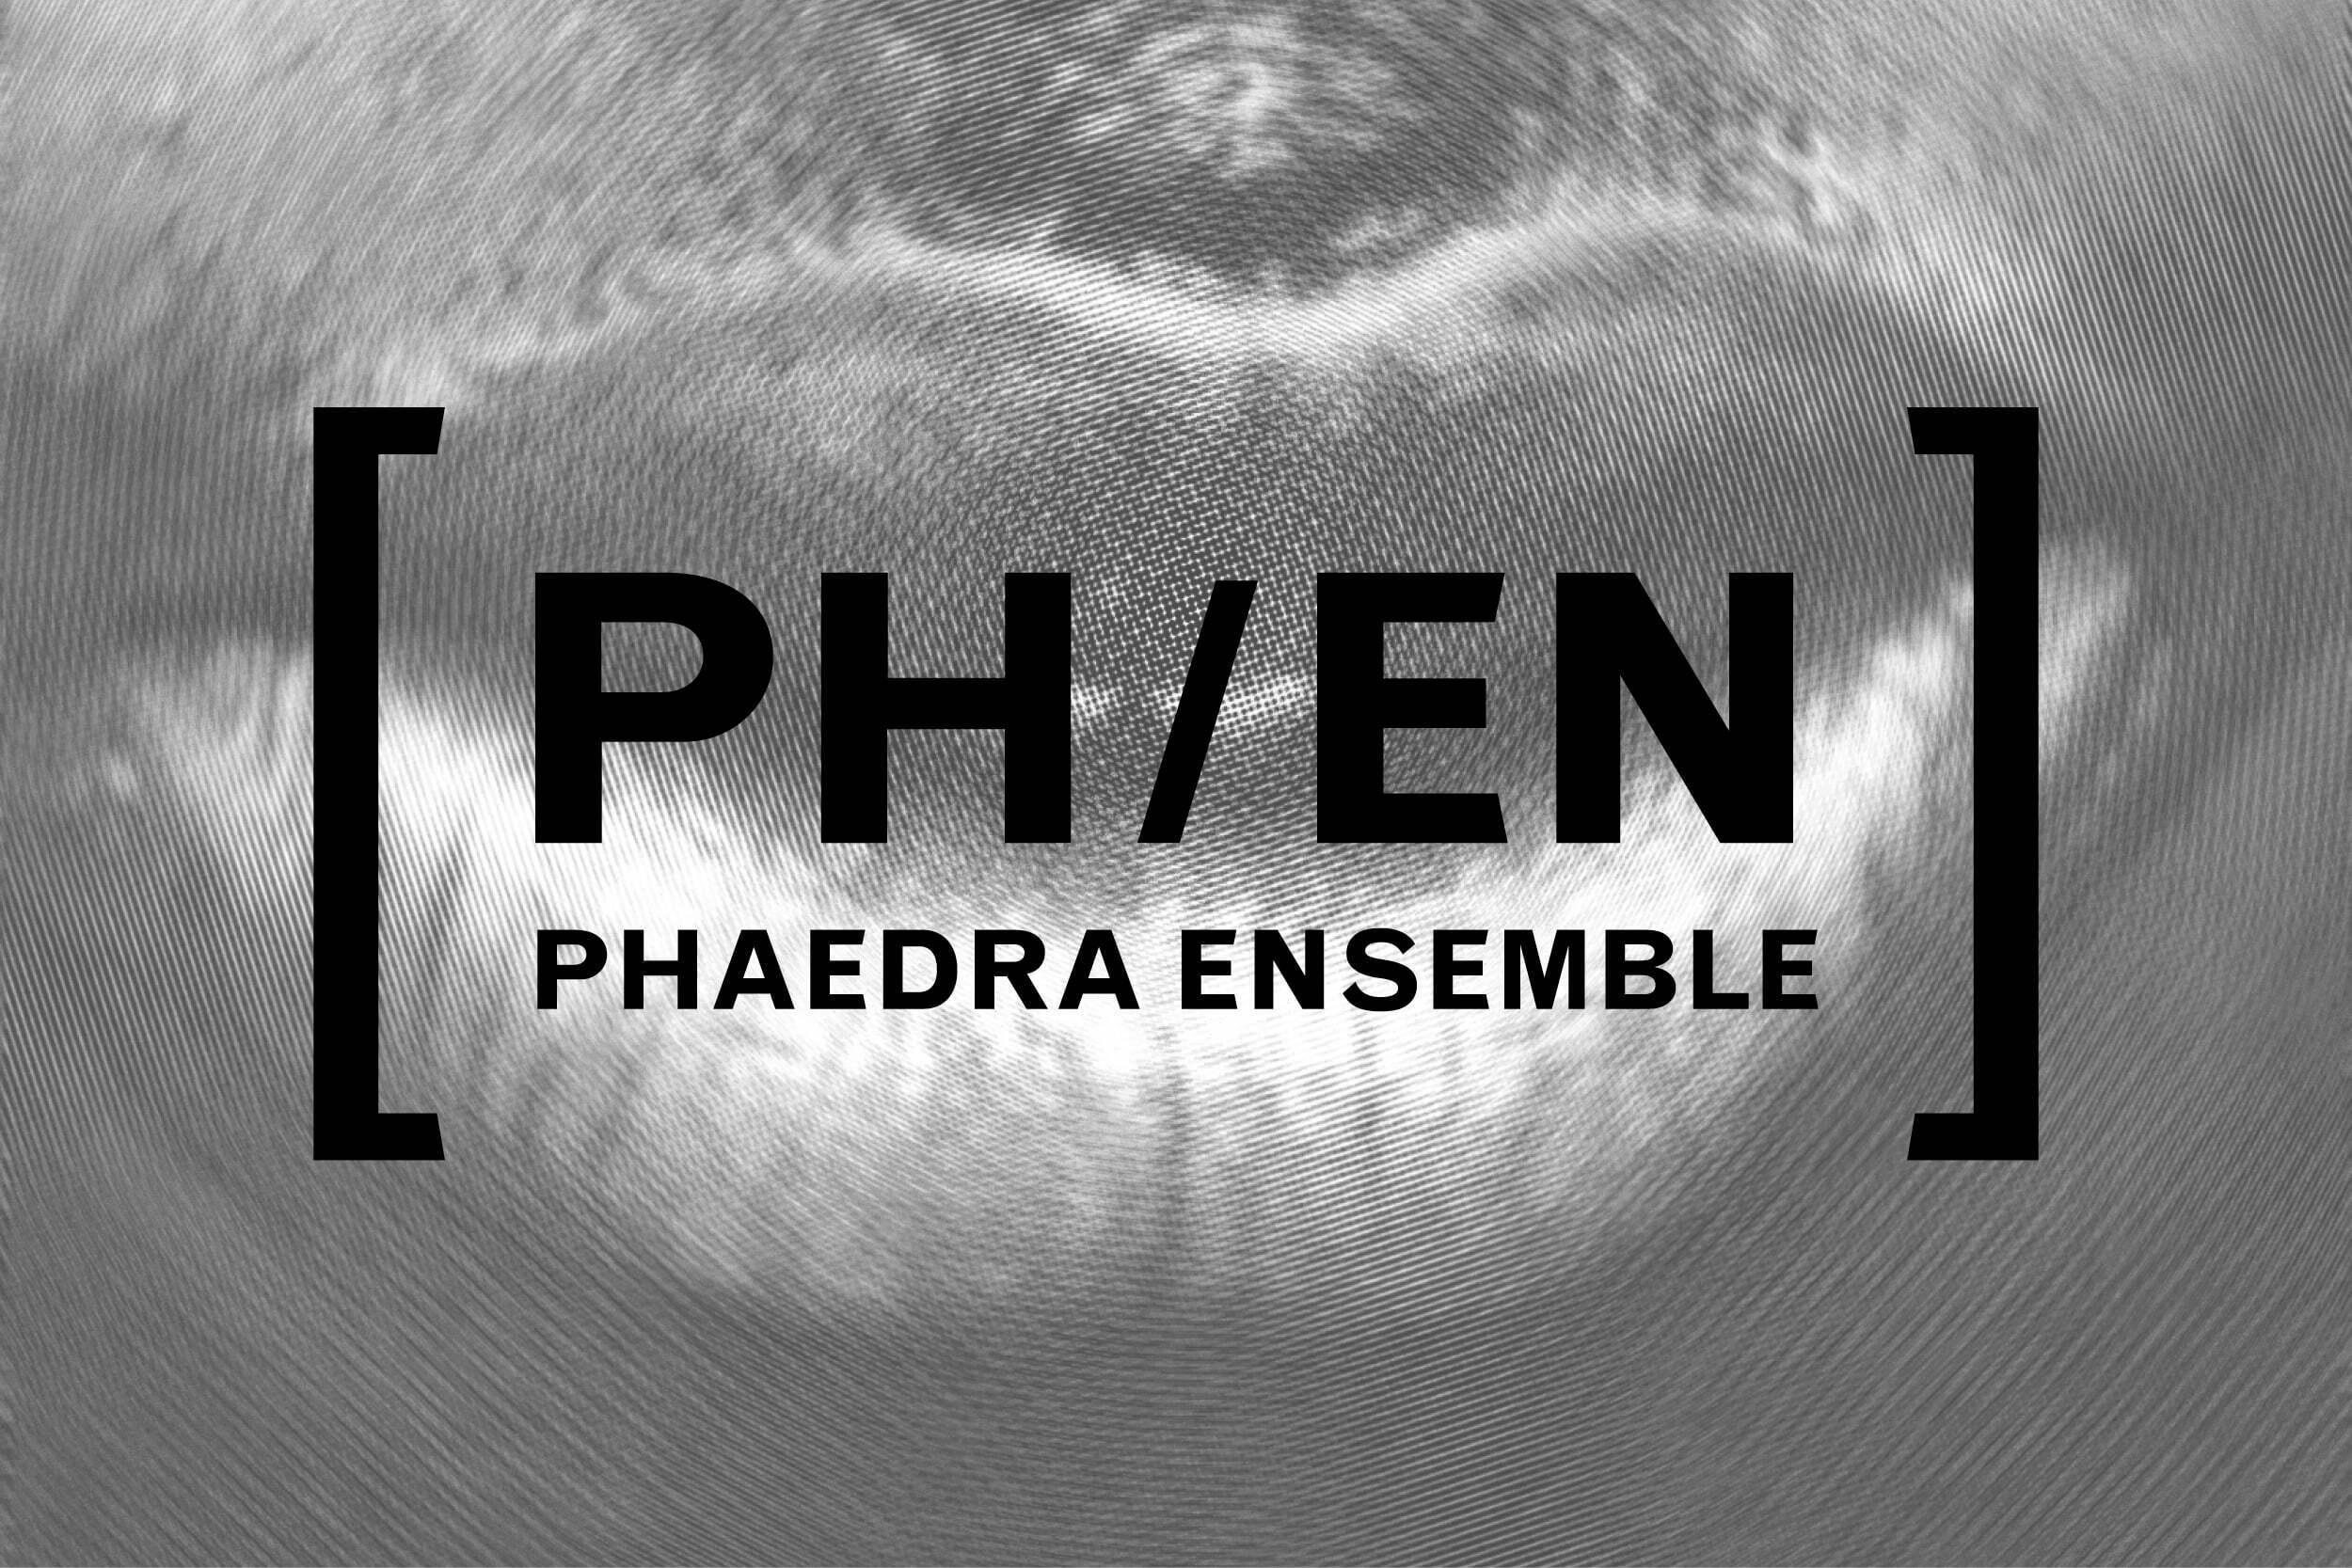 Phaedra Ensemble